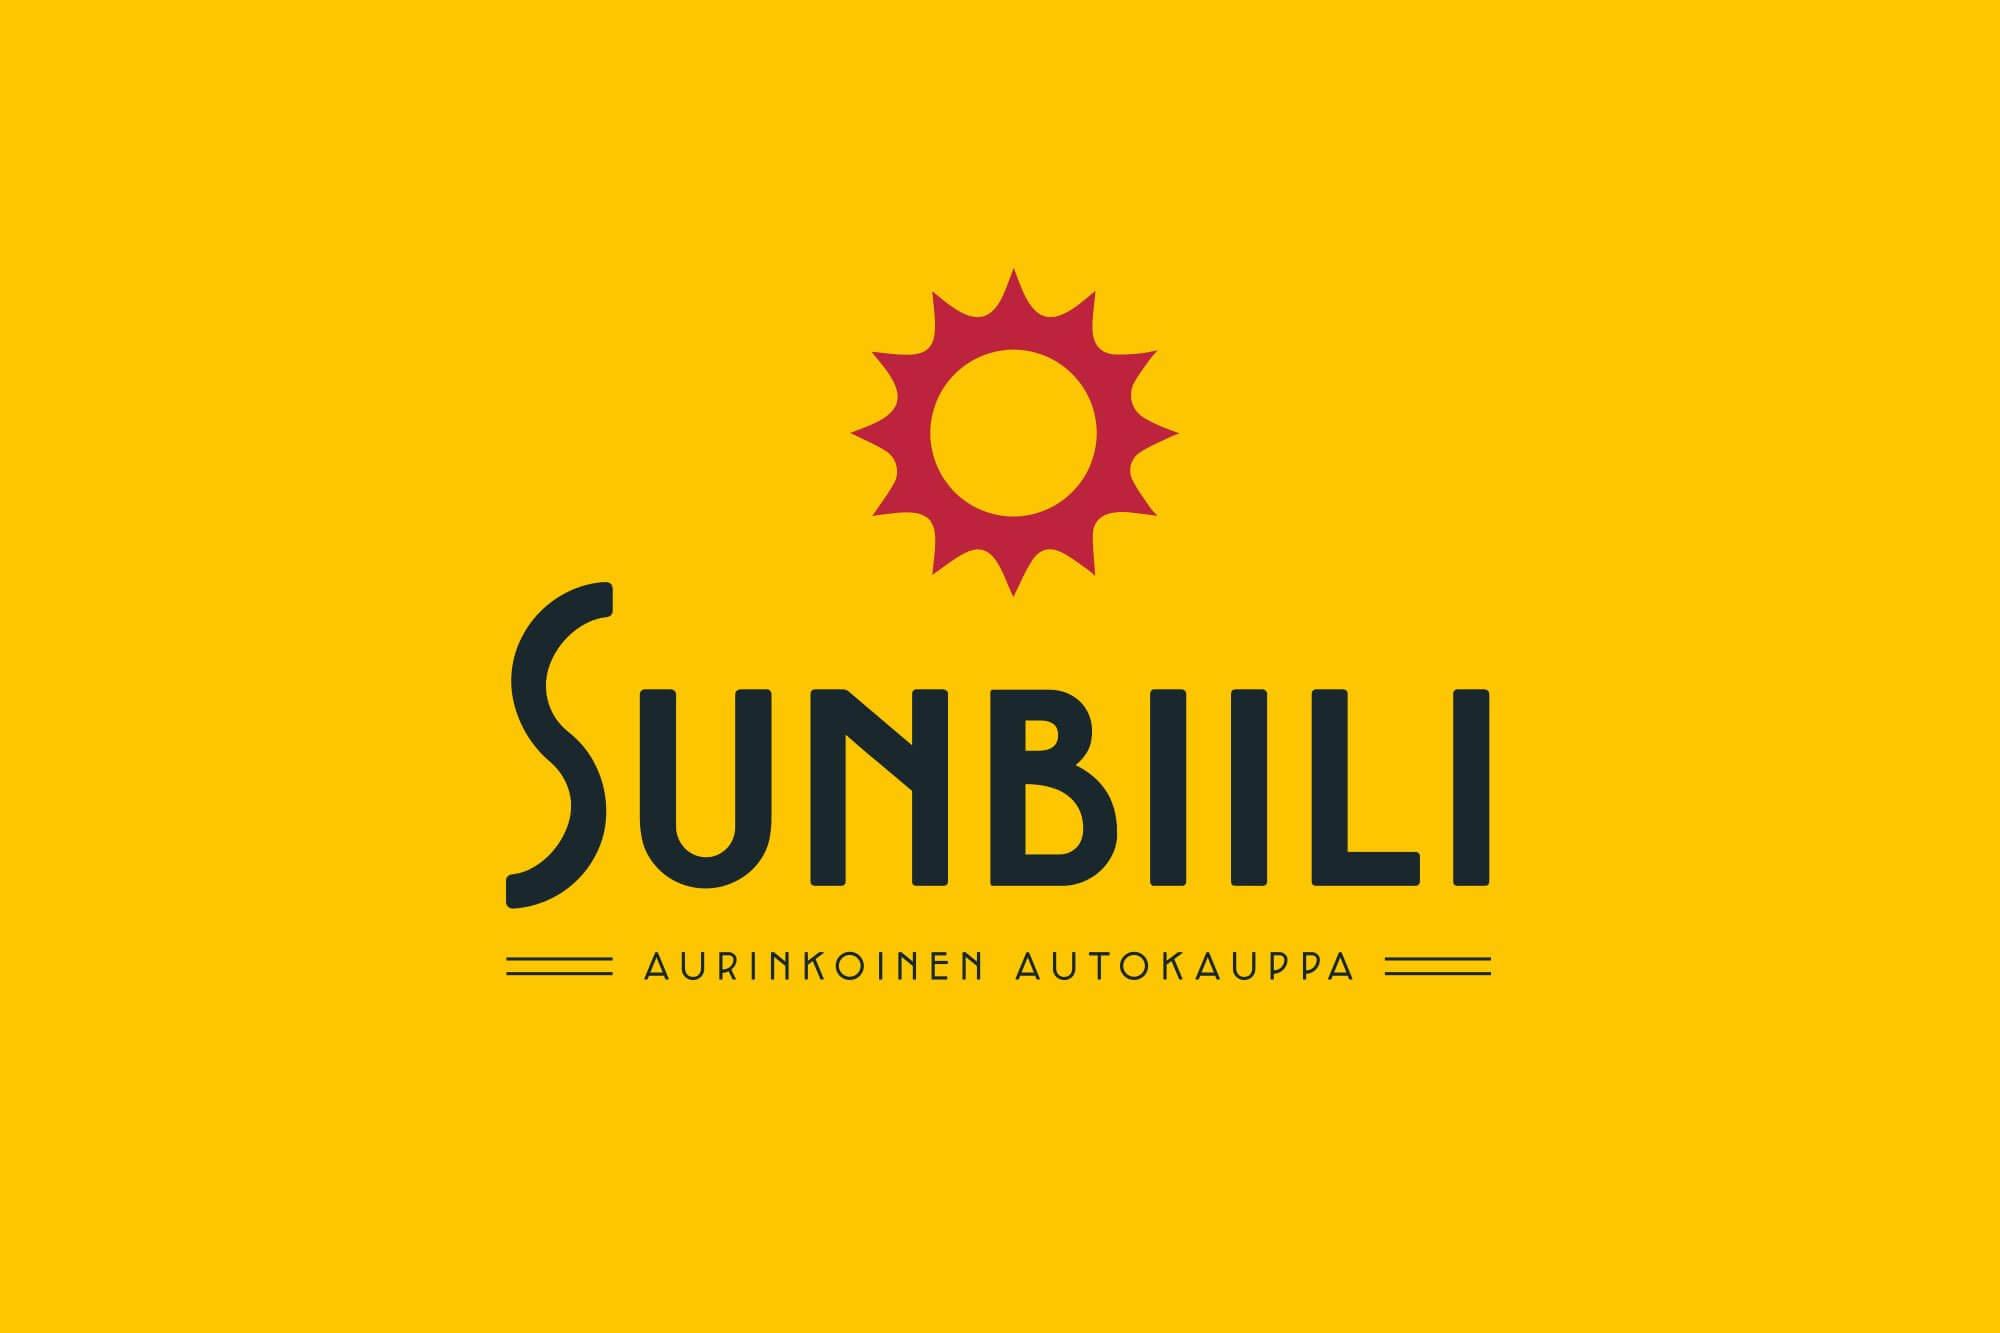 Sunbiili logo